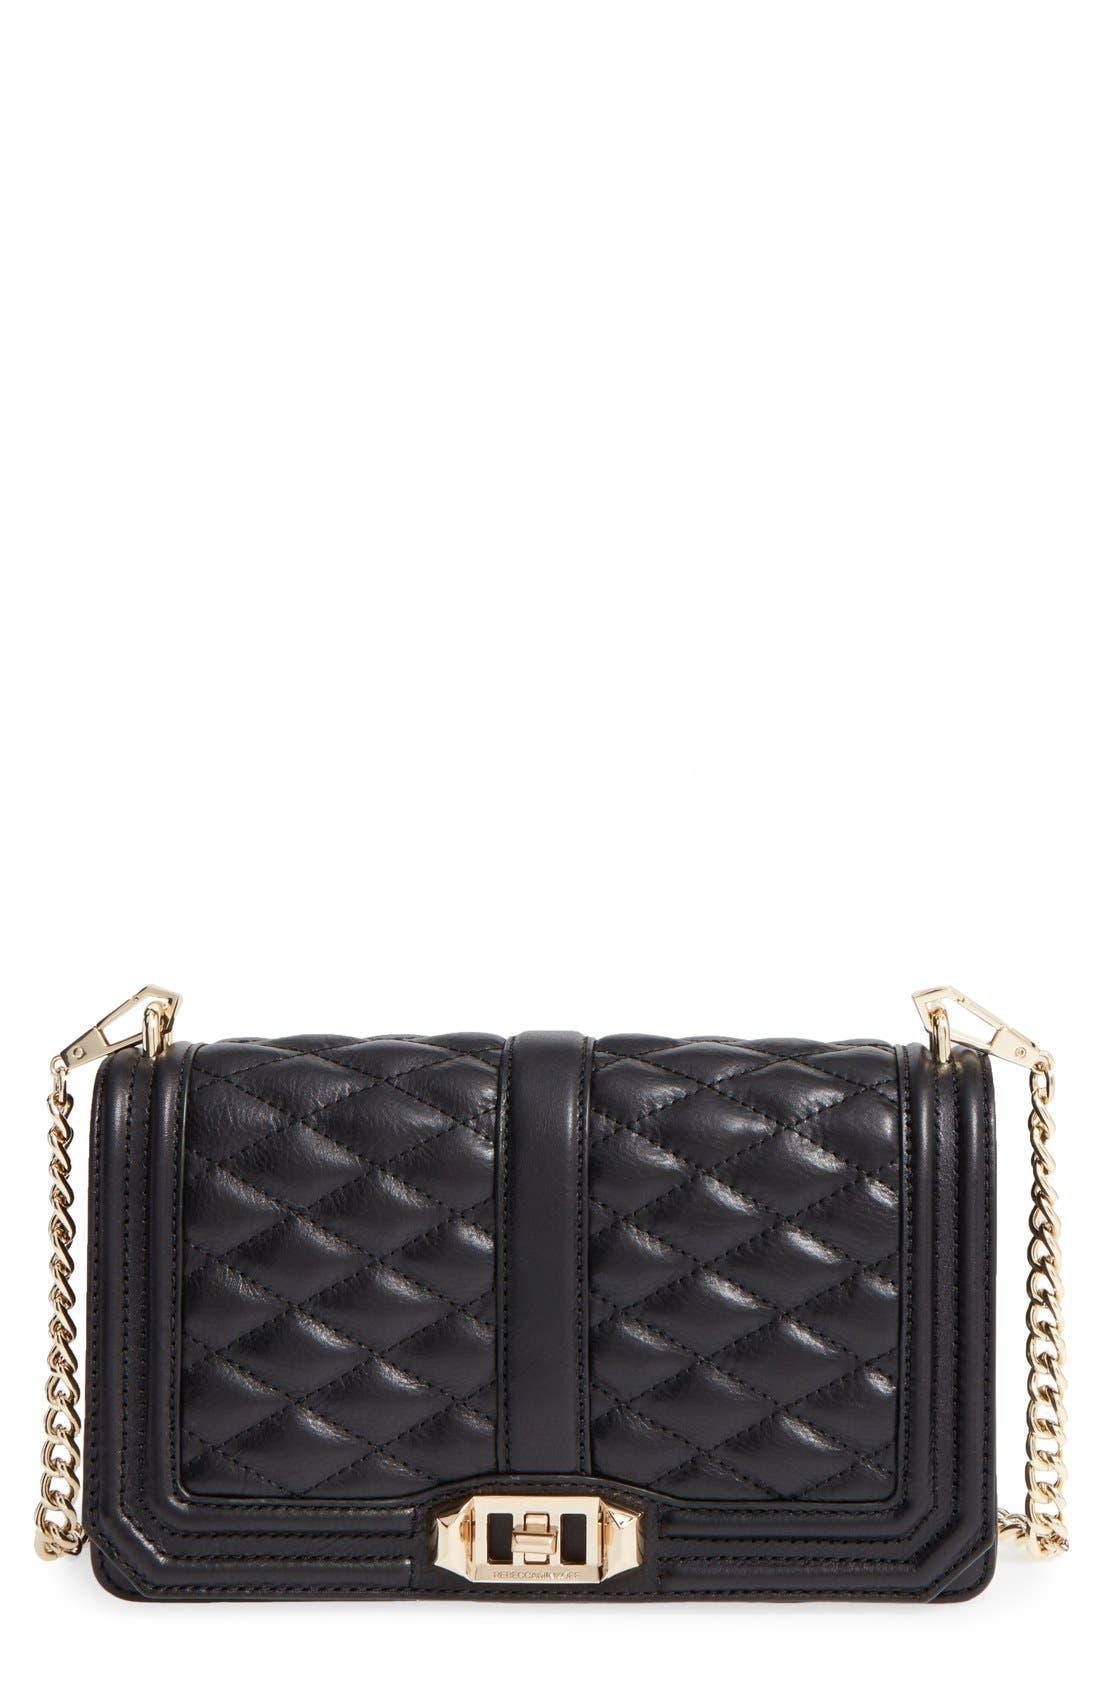 Main Image - Rebecca Minkoff Love Leather Crossbody Bag